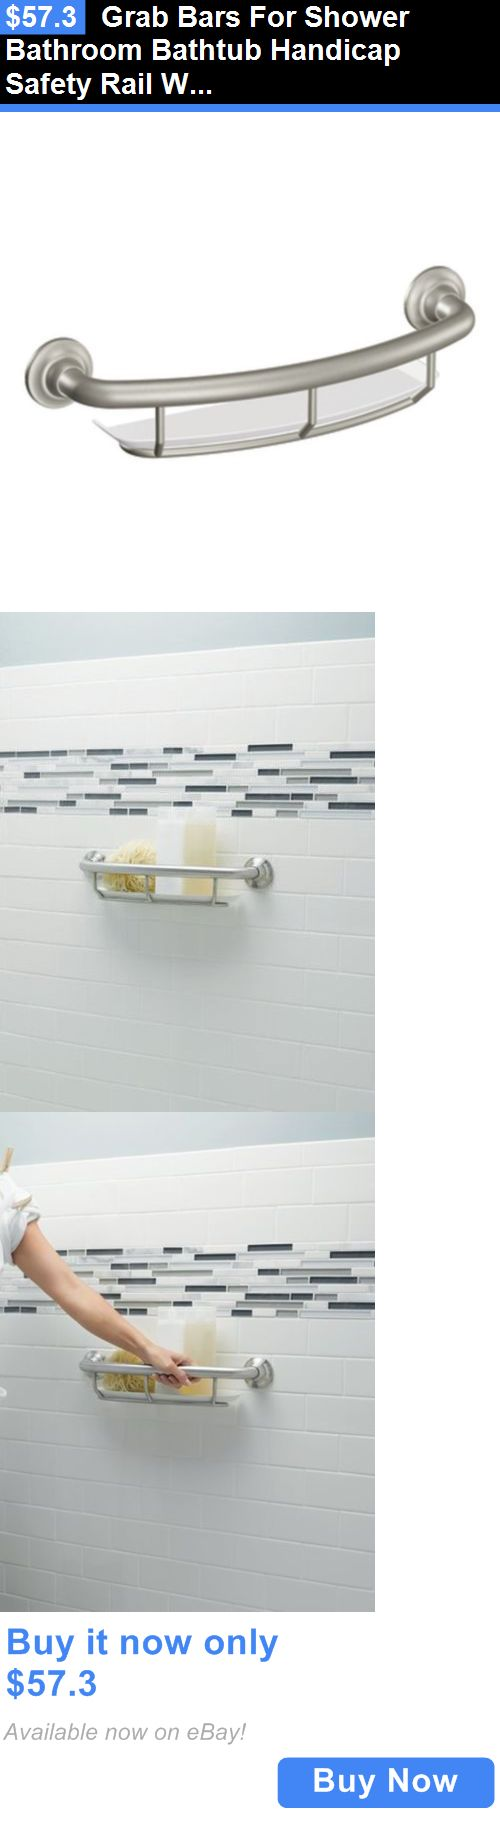 Handles And Rails: Grab Bars For Shower Bathroom Bathtub Handicap Safety  Rail With Shelf Grip